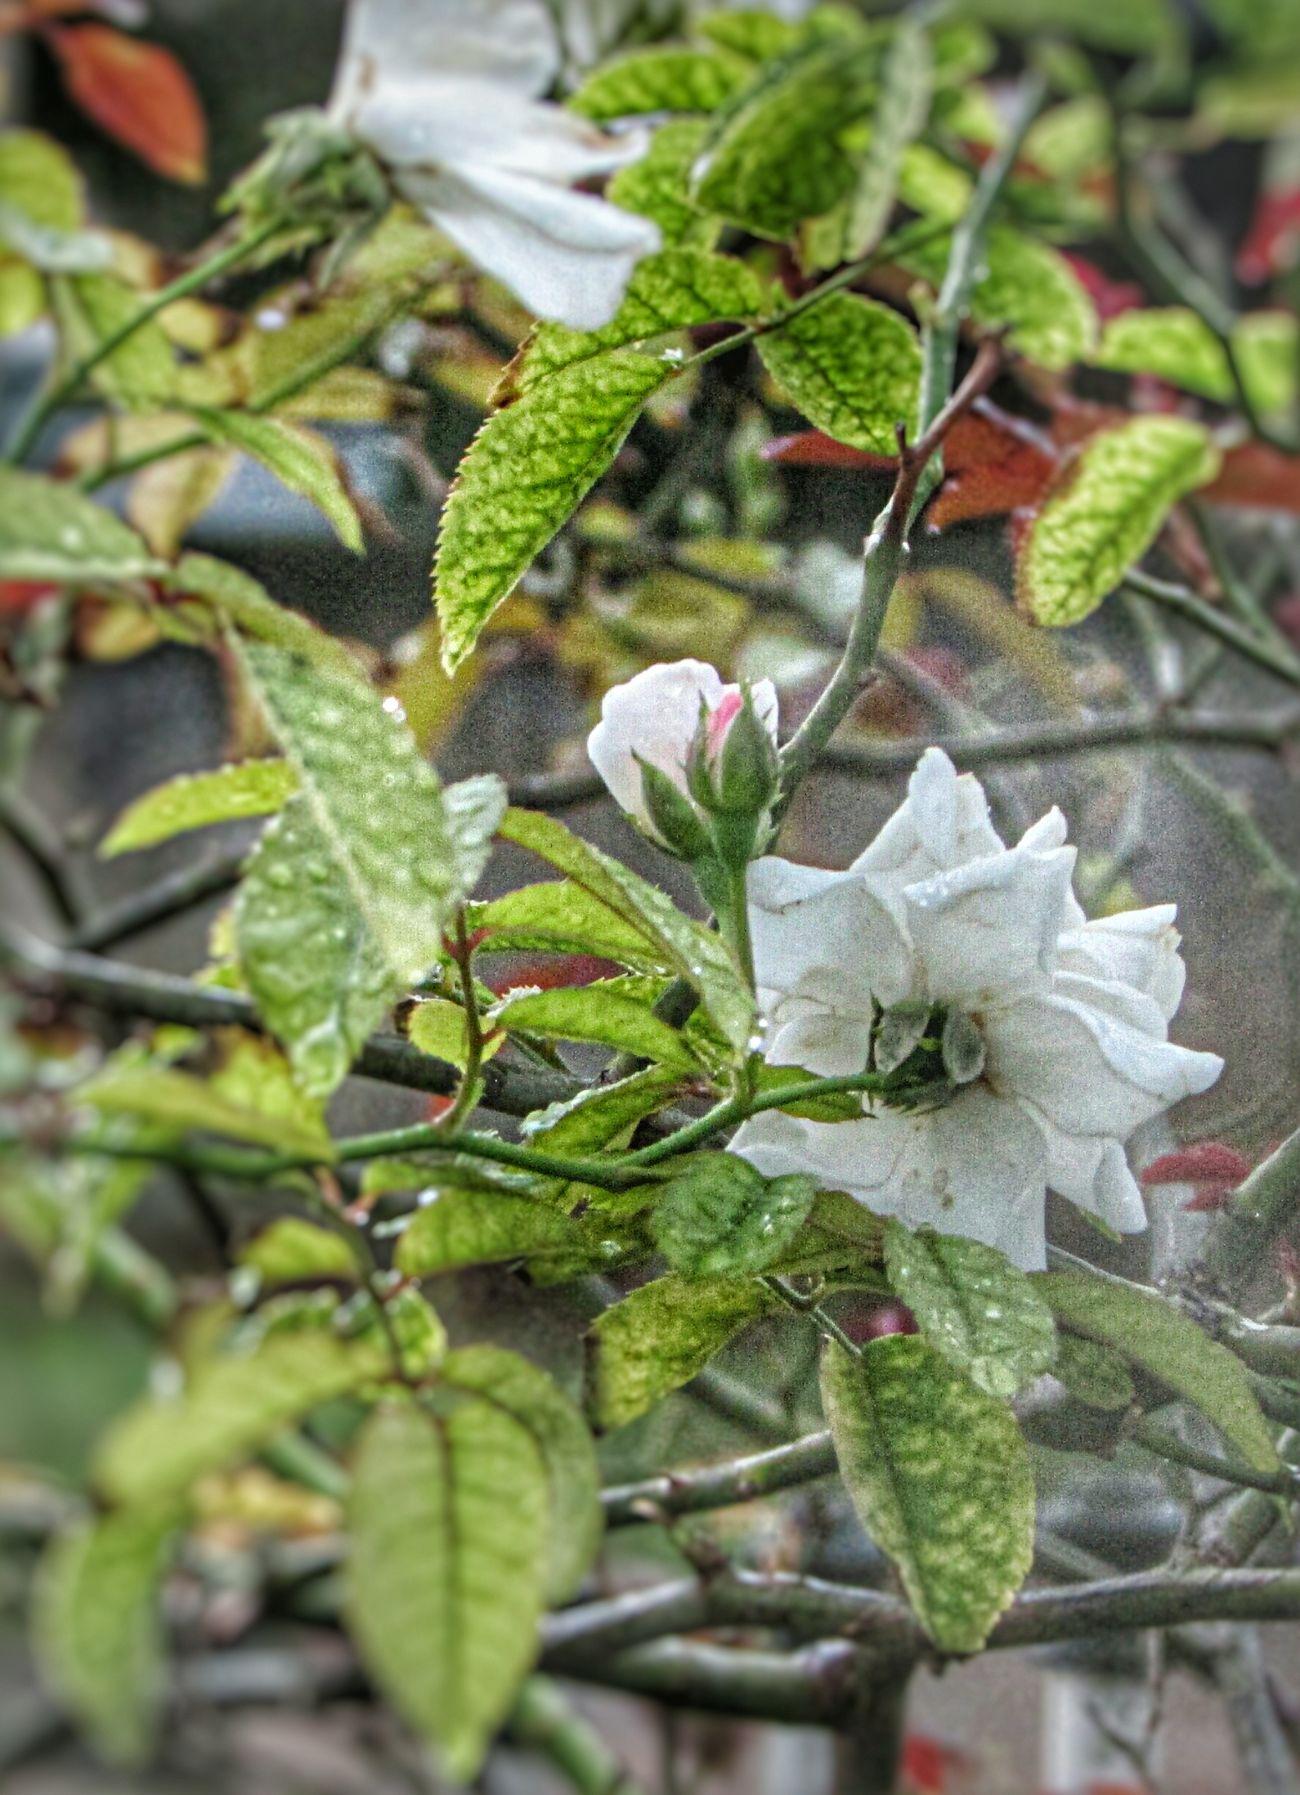 Nature Flower Flores Chuva Chuva⛈🌦🌧🌩 Joinville Brasil ♥ Flores Brazil Flowers Flores Brancas 🌼💐 EyeEmNewHere